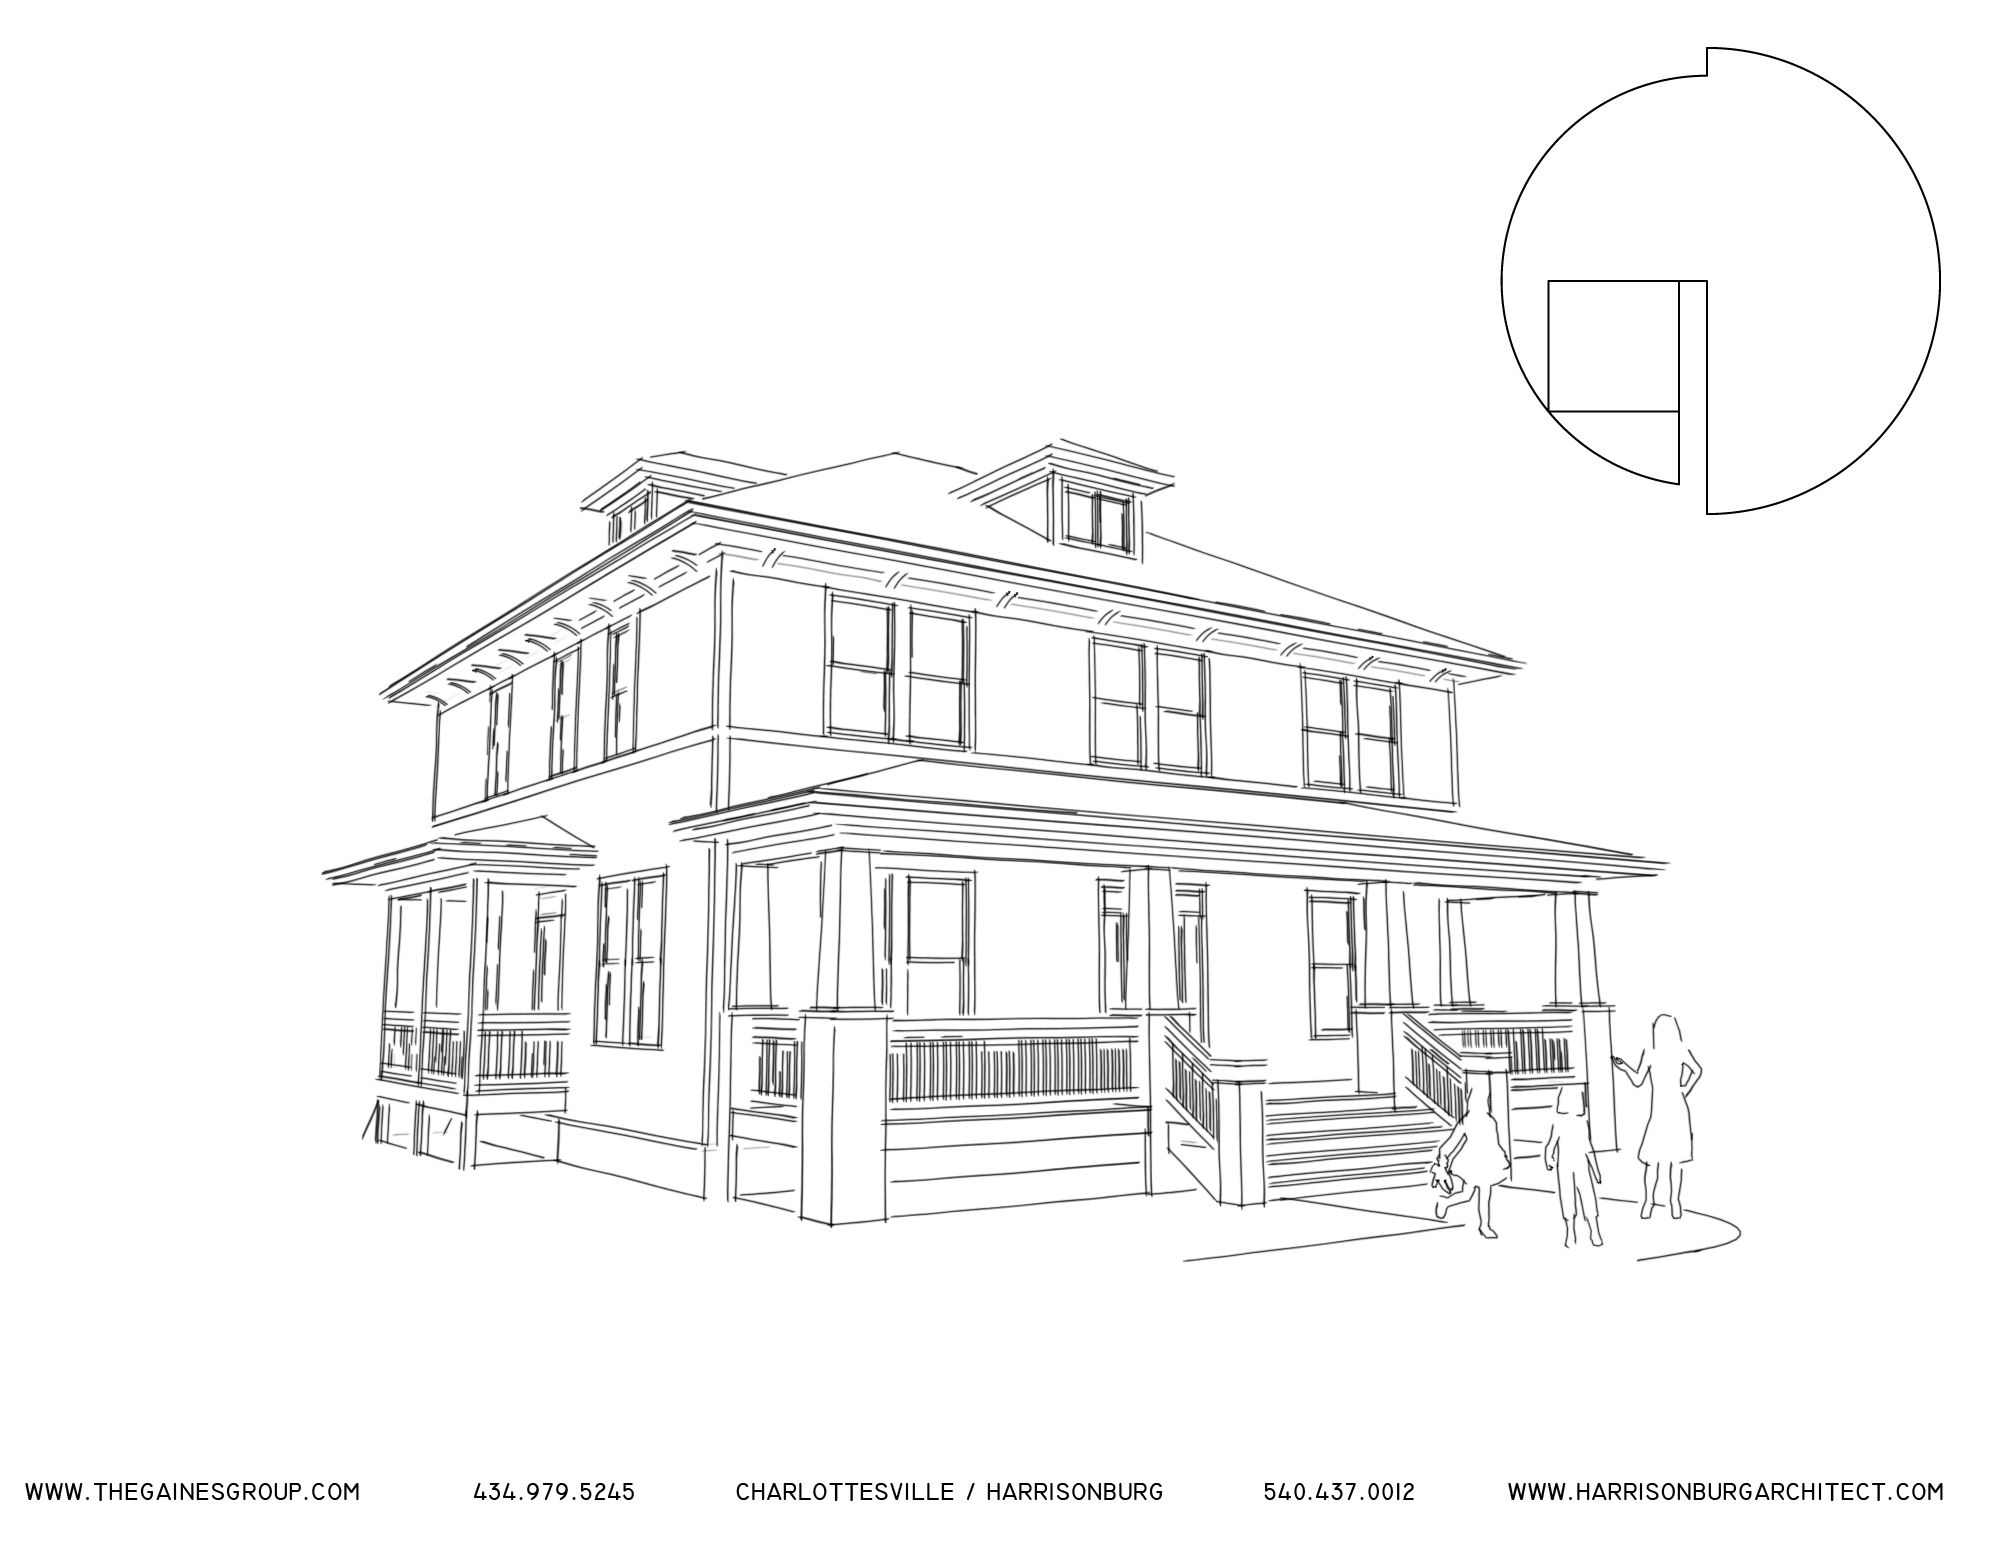 S Harrisonburgarchitectles Wordpress 09 Architectural Coloring Book